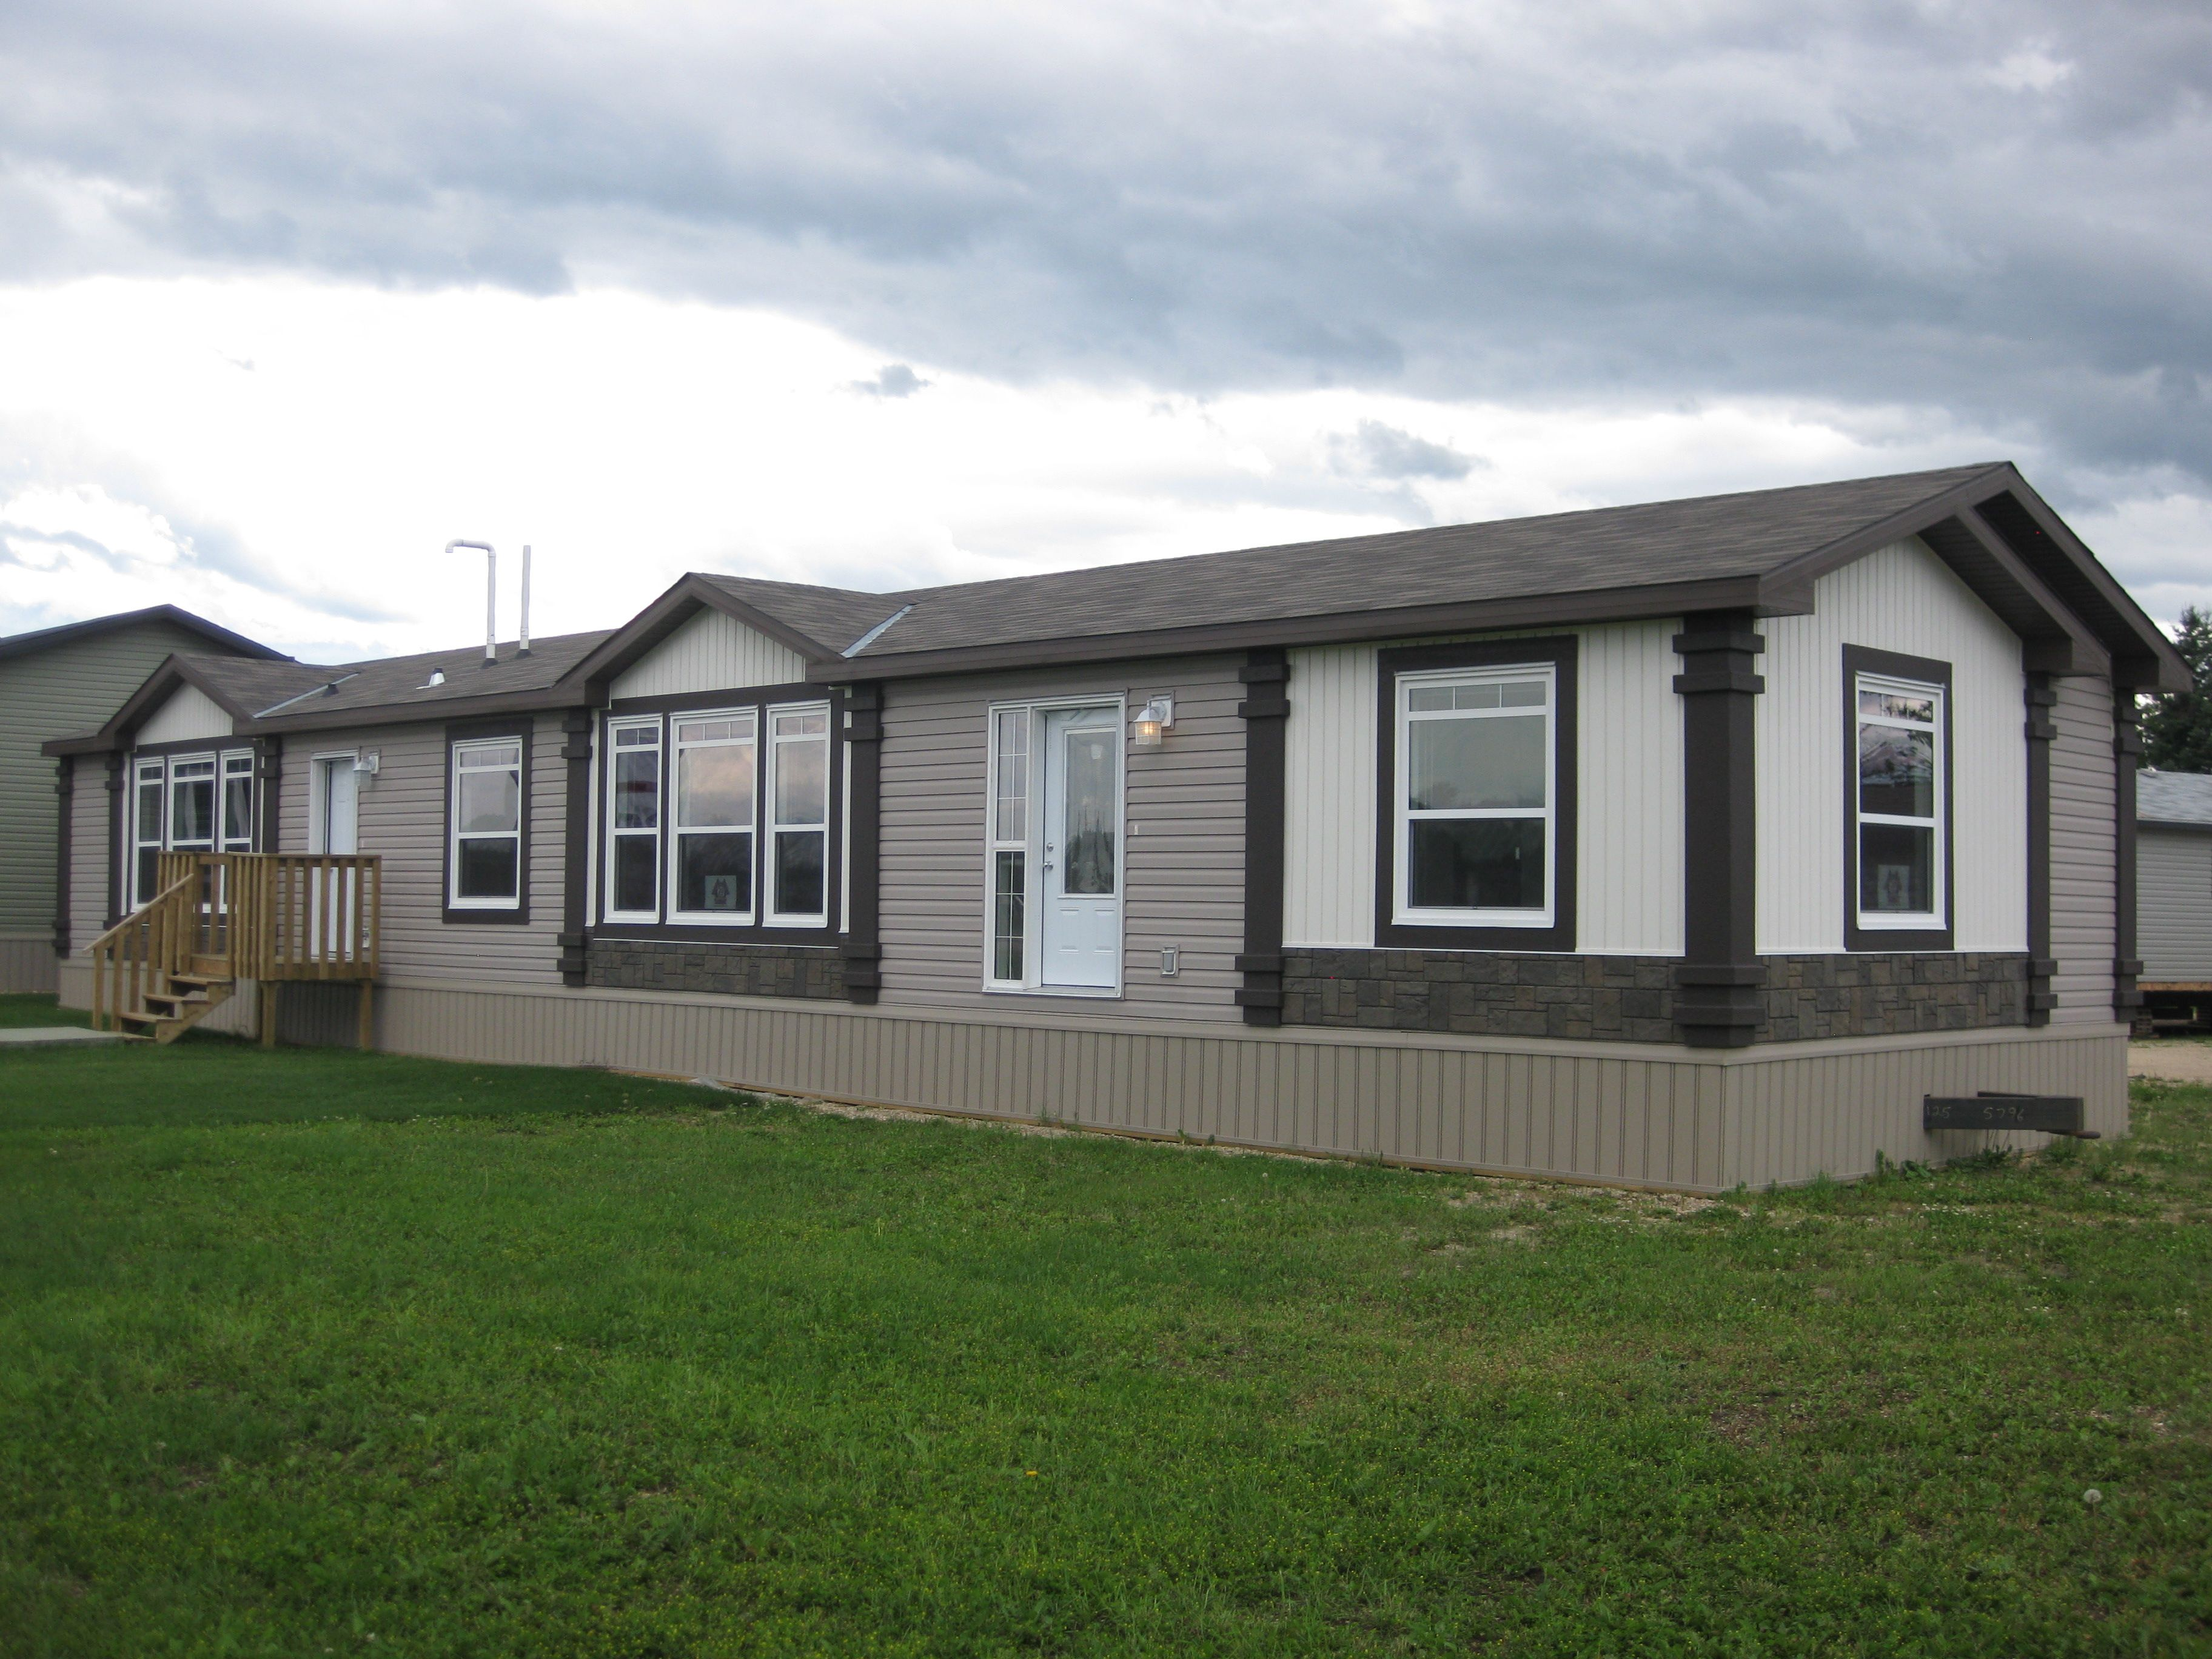 20 wide modular homes